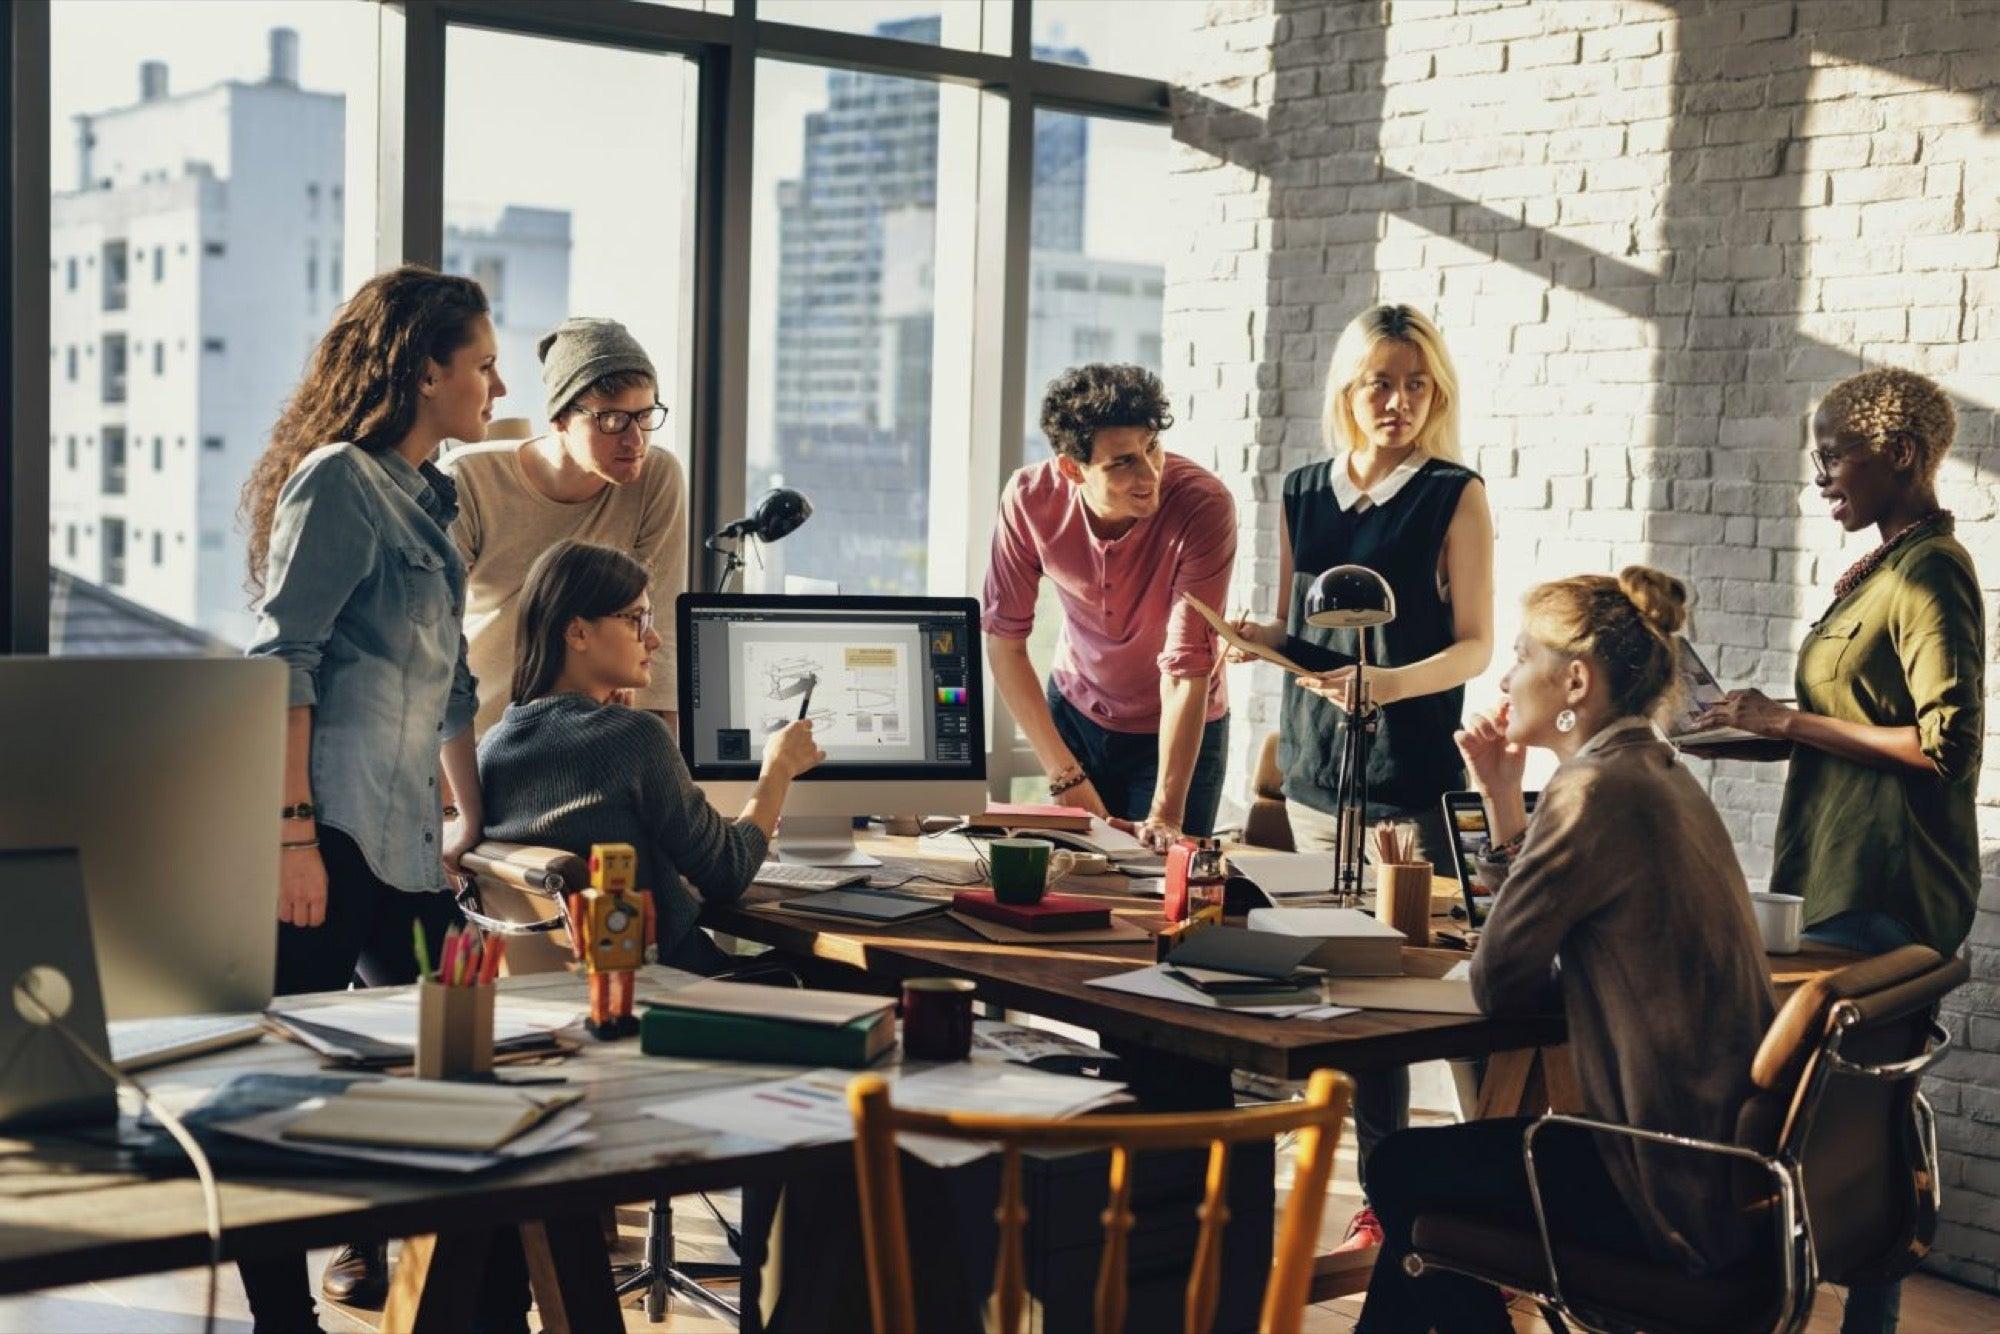 Работа в стартапах удаленно работа на дому удаленно в новосибирске вакансии